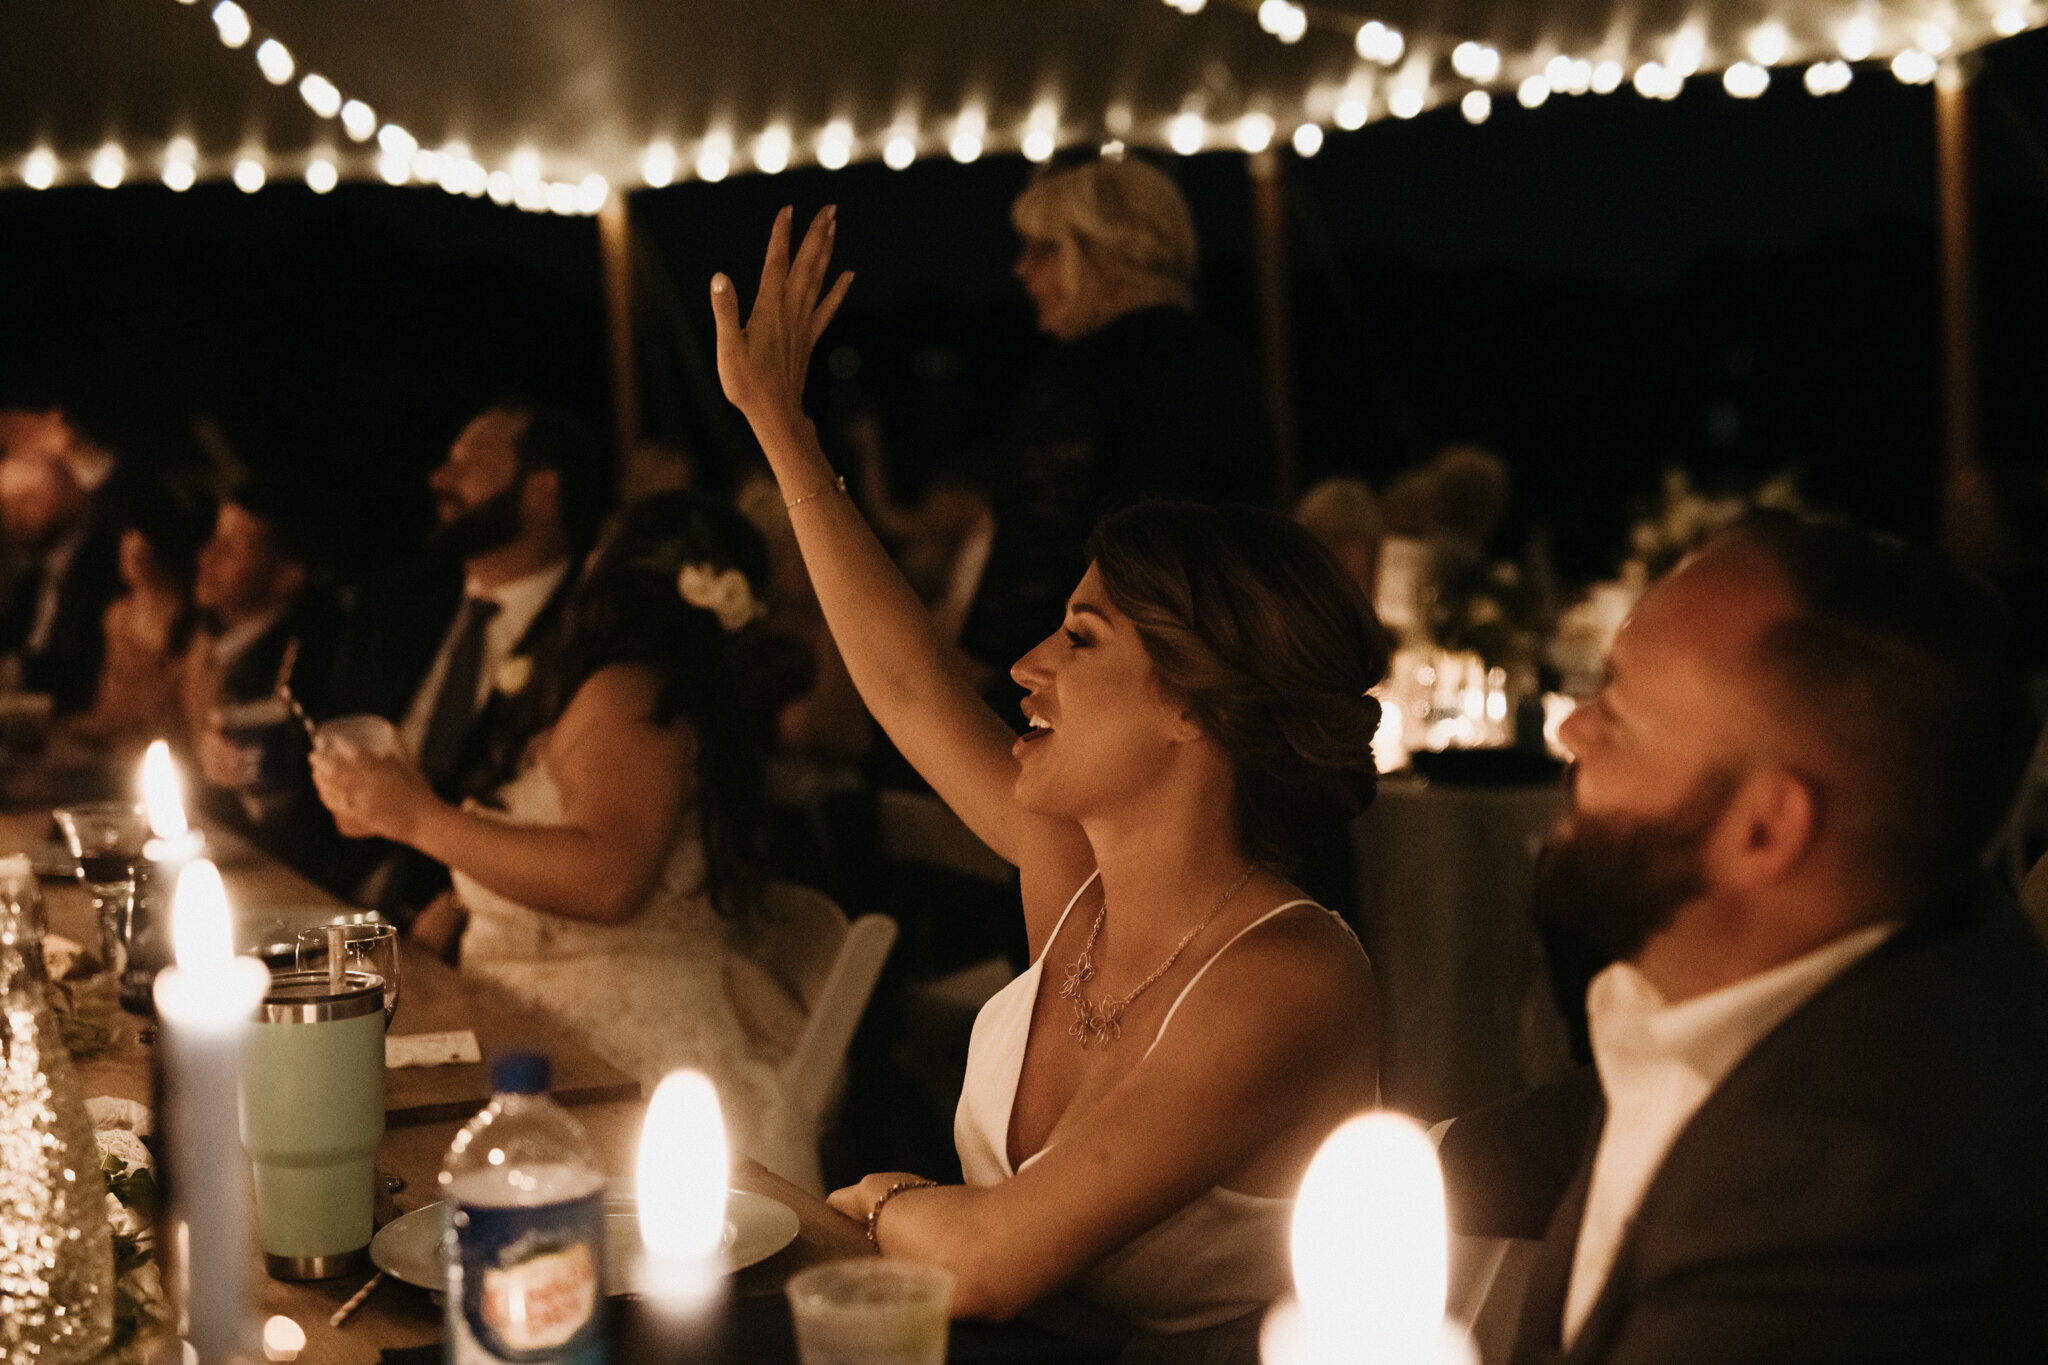 angela_jason_norfolk_wedding-151.jpg